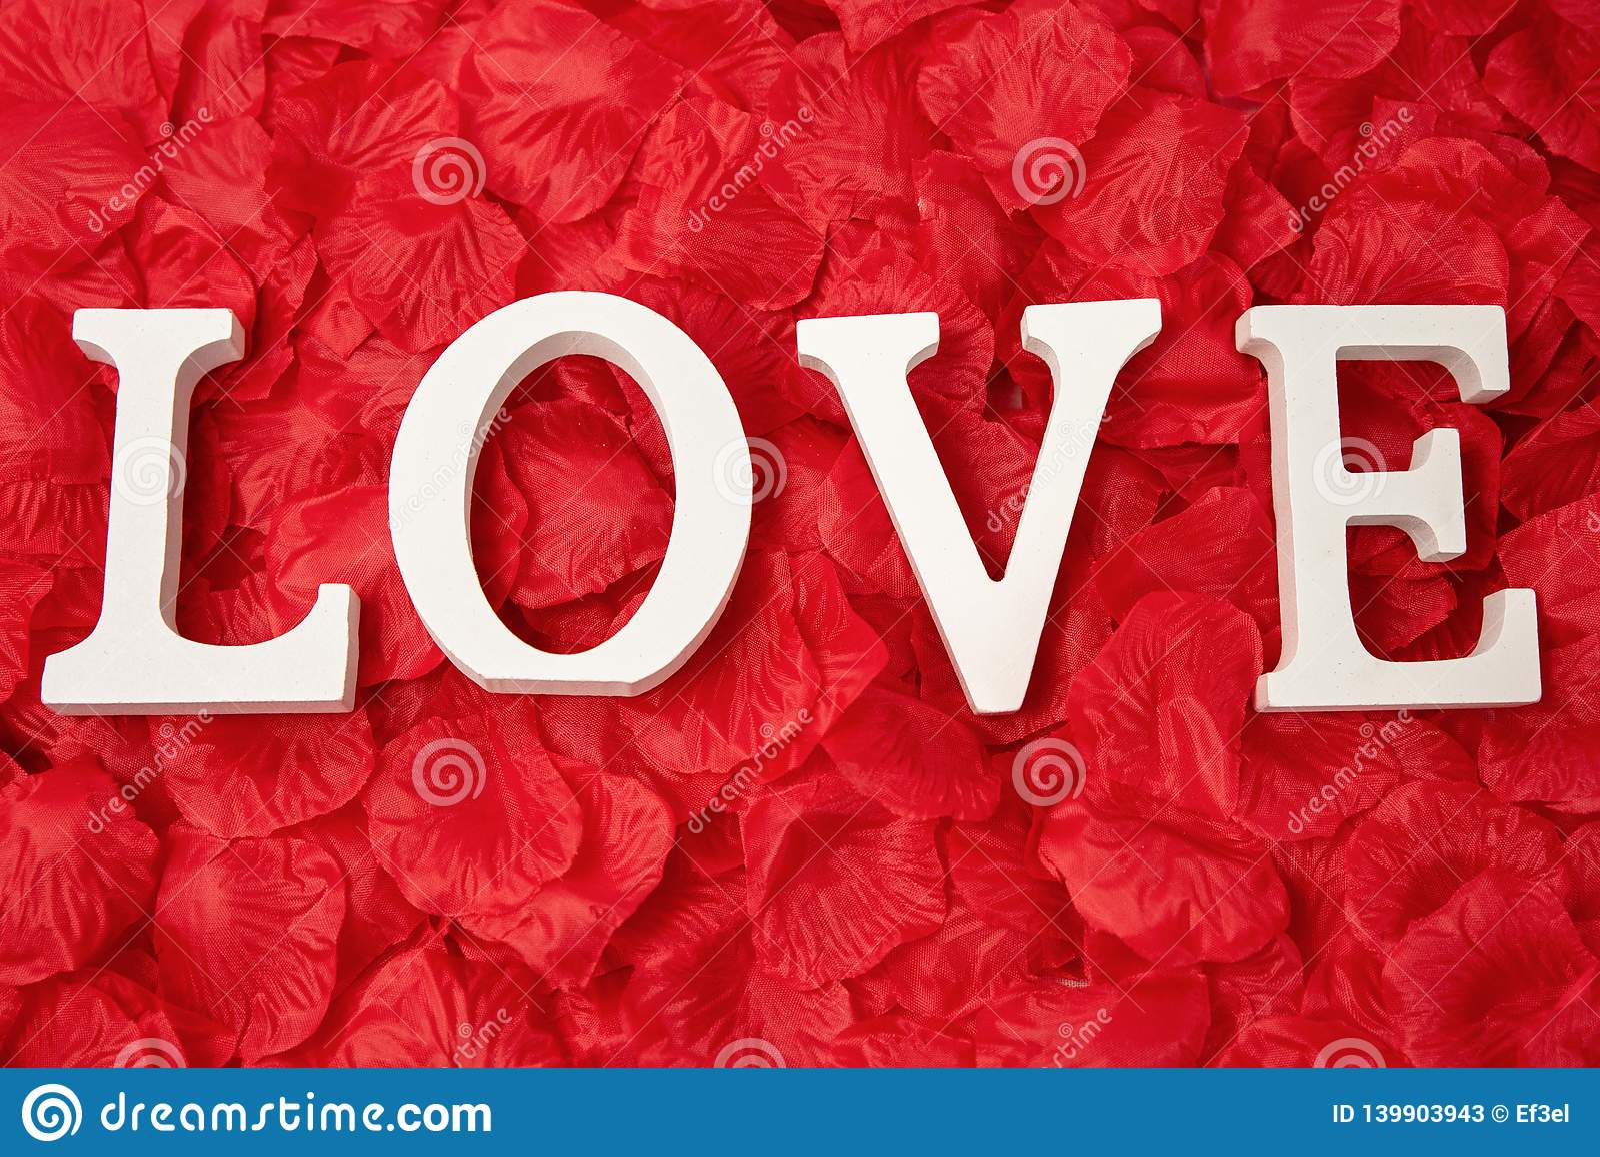 Love Word Of Roses Petals Wallpaper Stock Image Image Of Petals